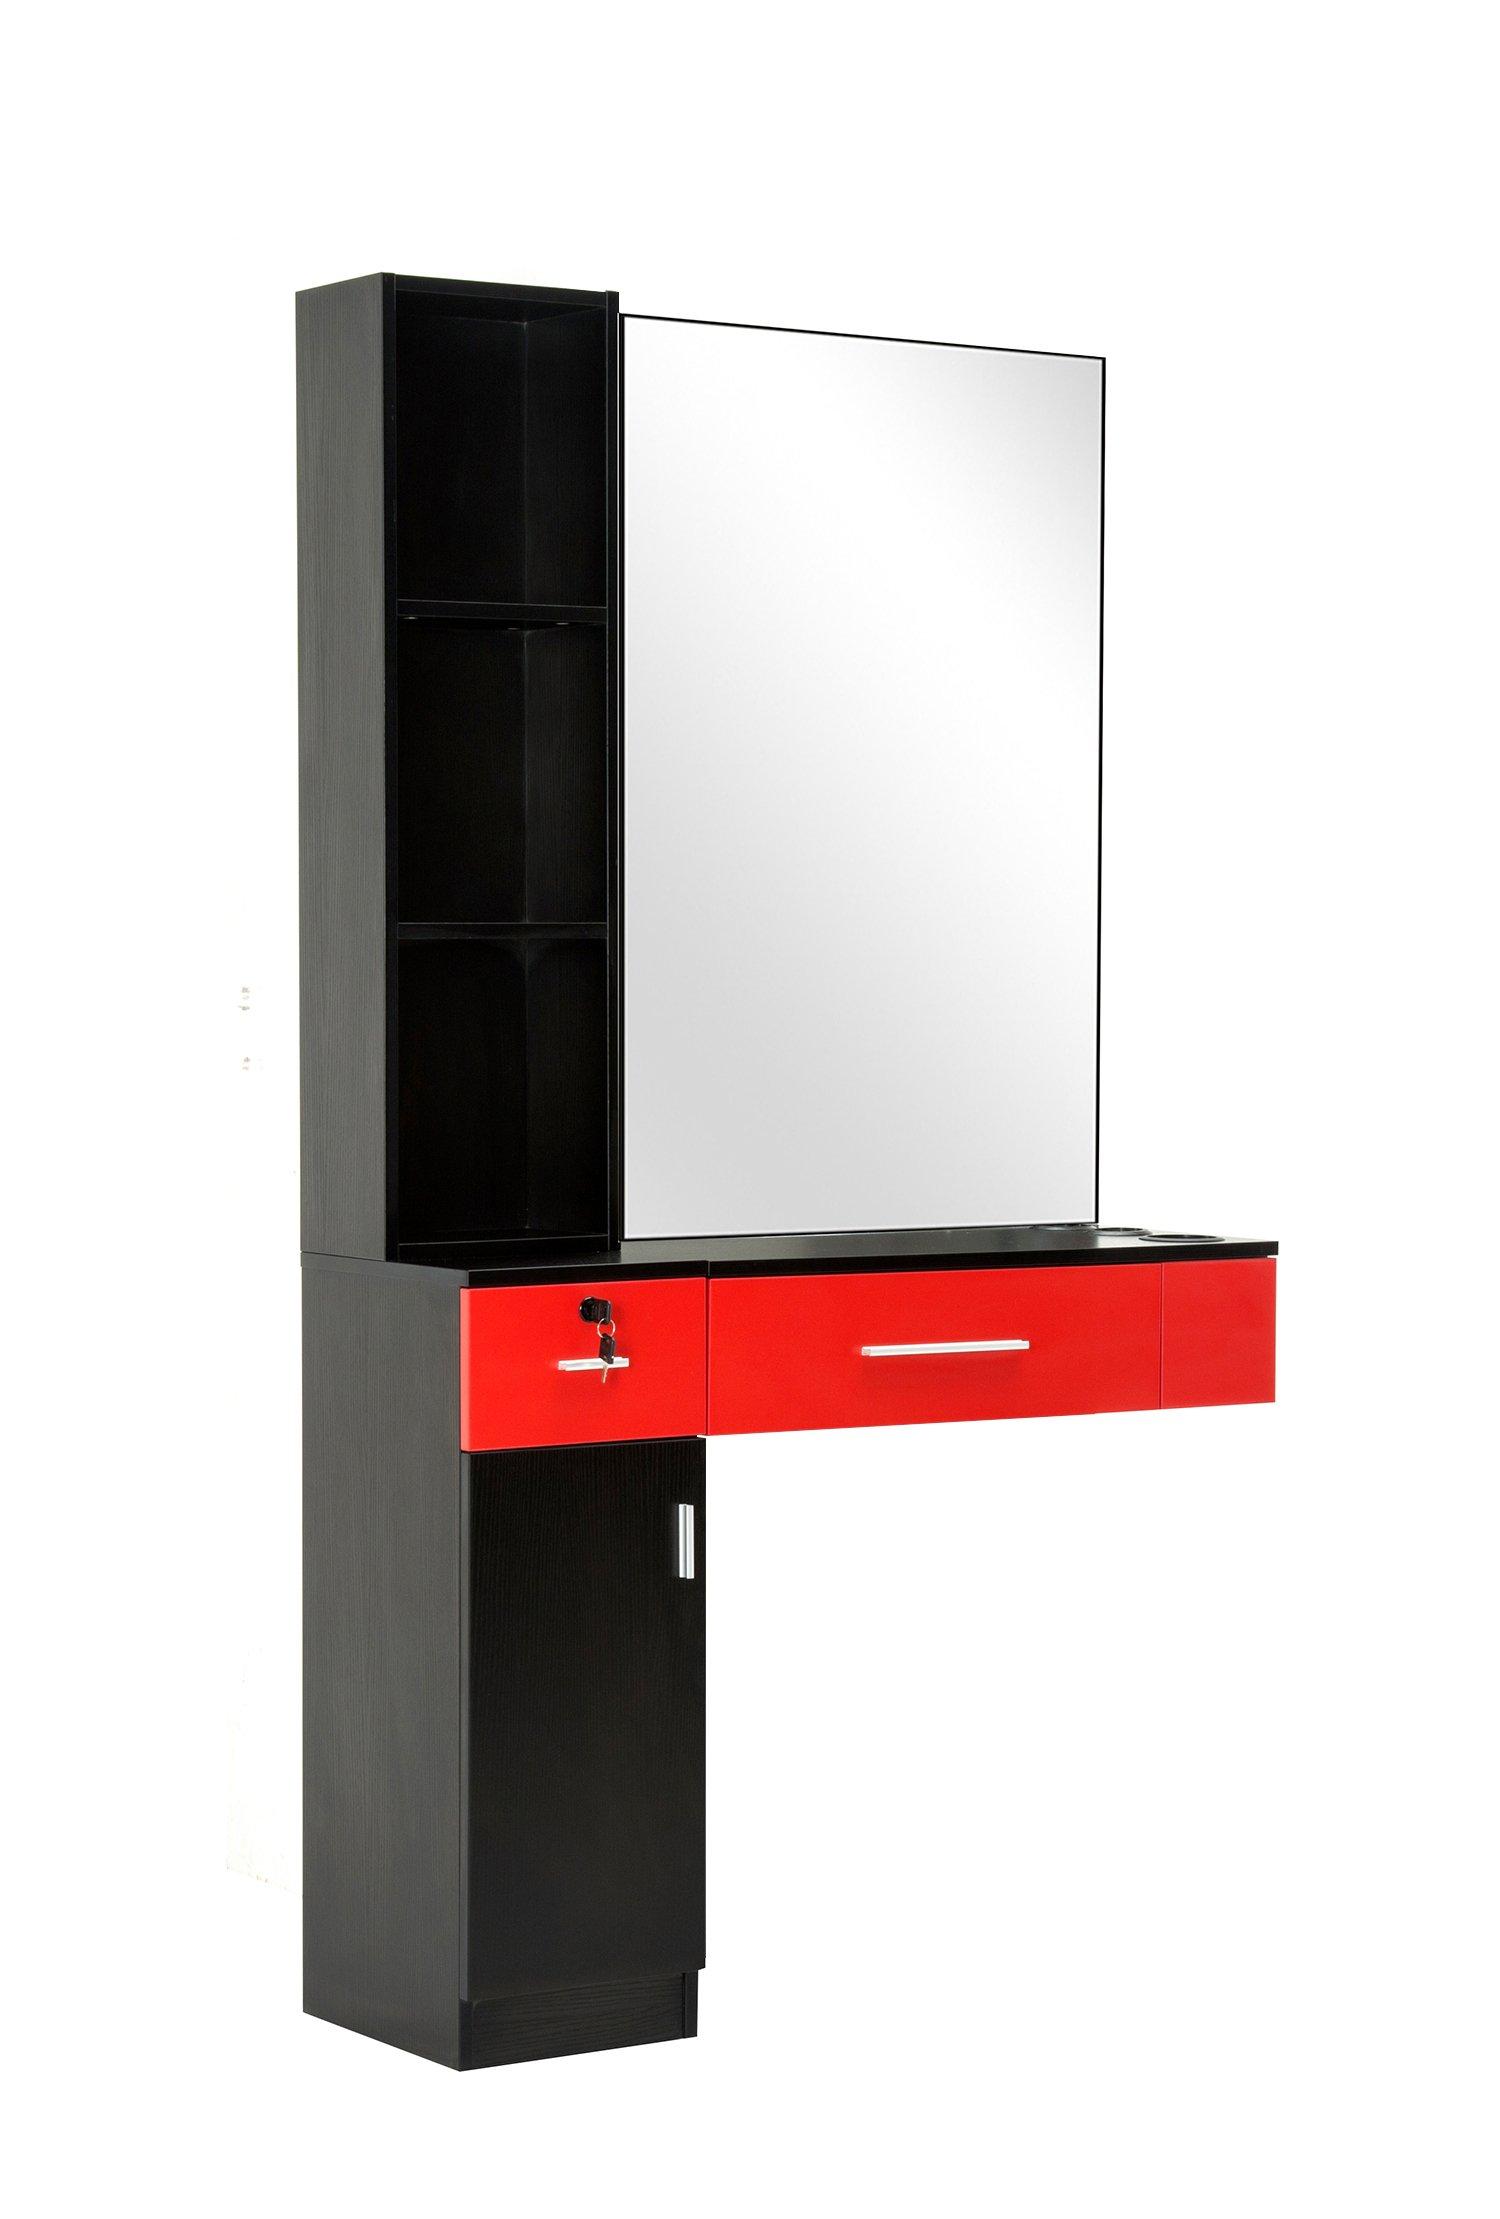 BarberPub Beauty Salon Spa Equipment Set Wall Mount Hair Styling Station W/ Mirror 3036 (Red & Black)